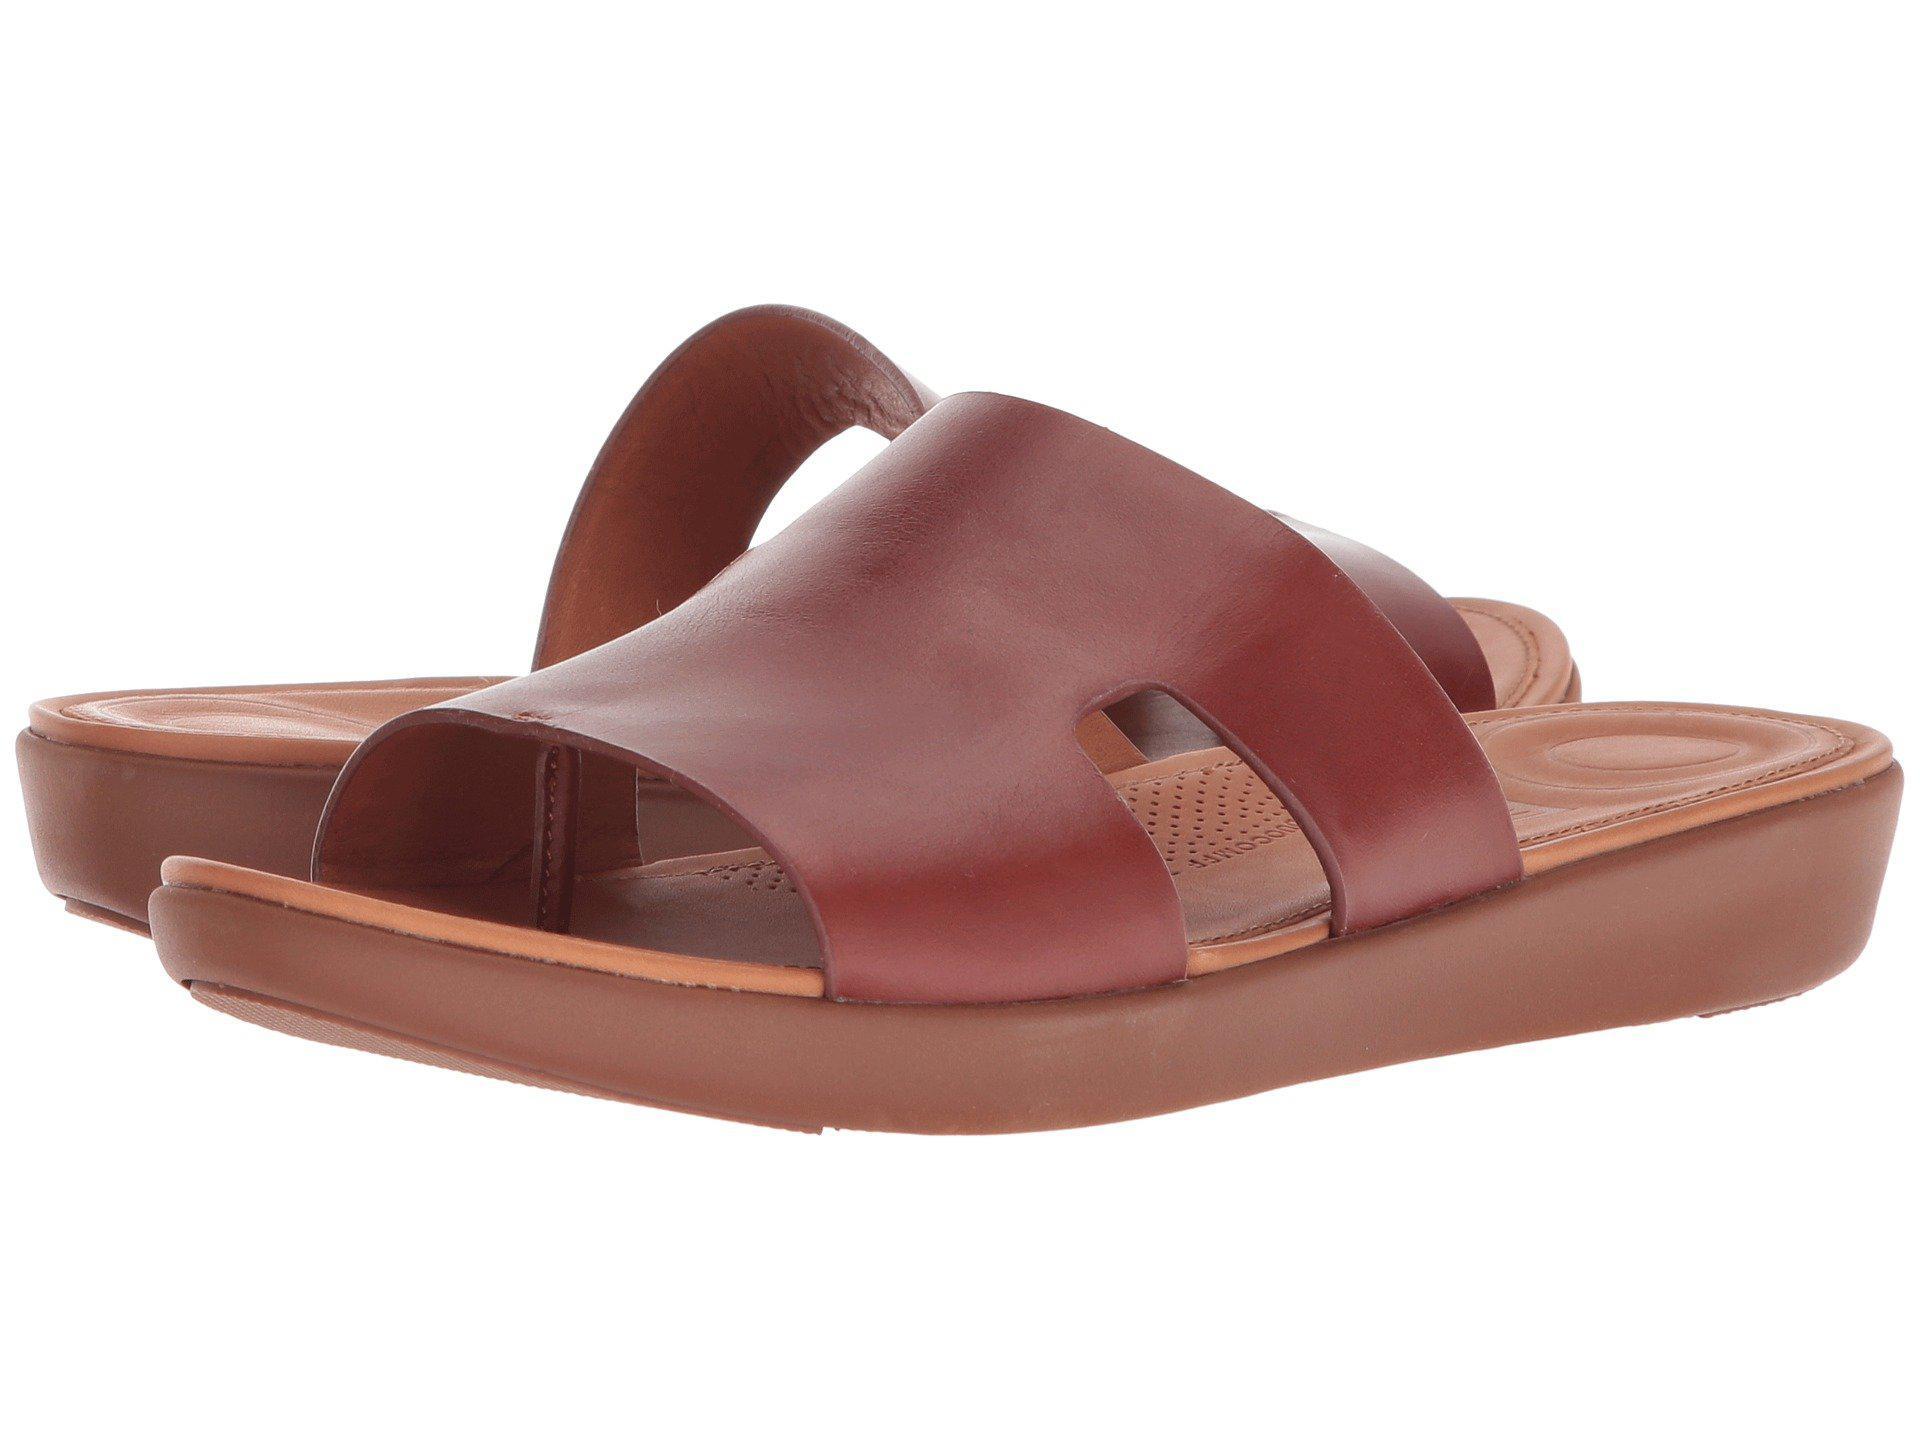 Fitflop Leather H-bar Slide Sandals for